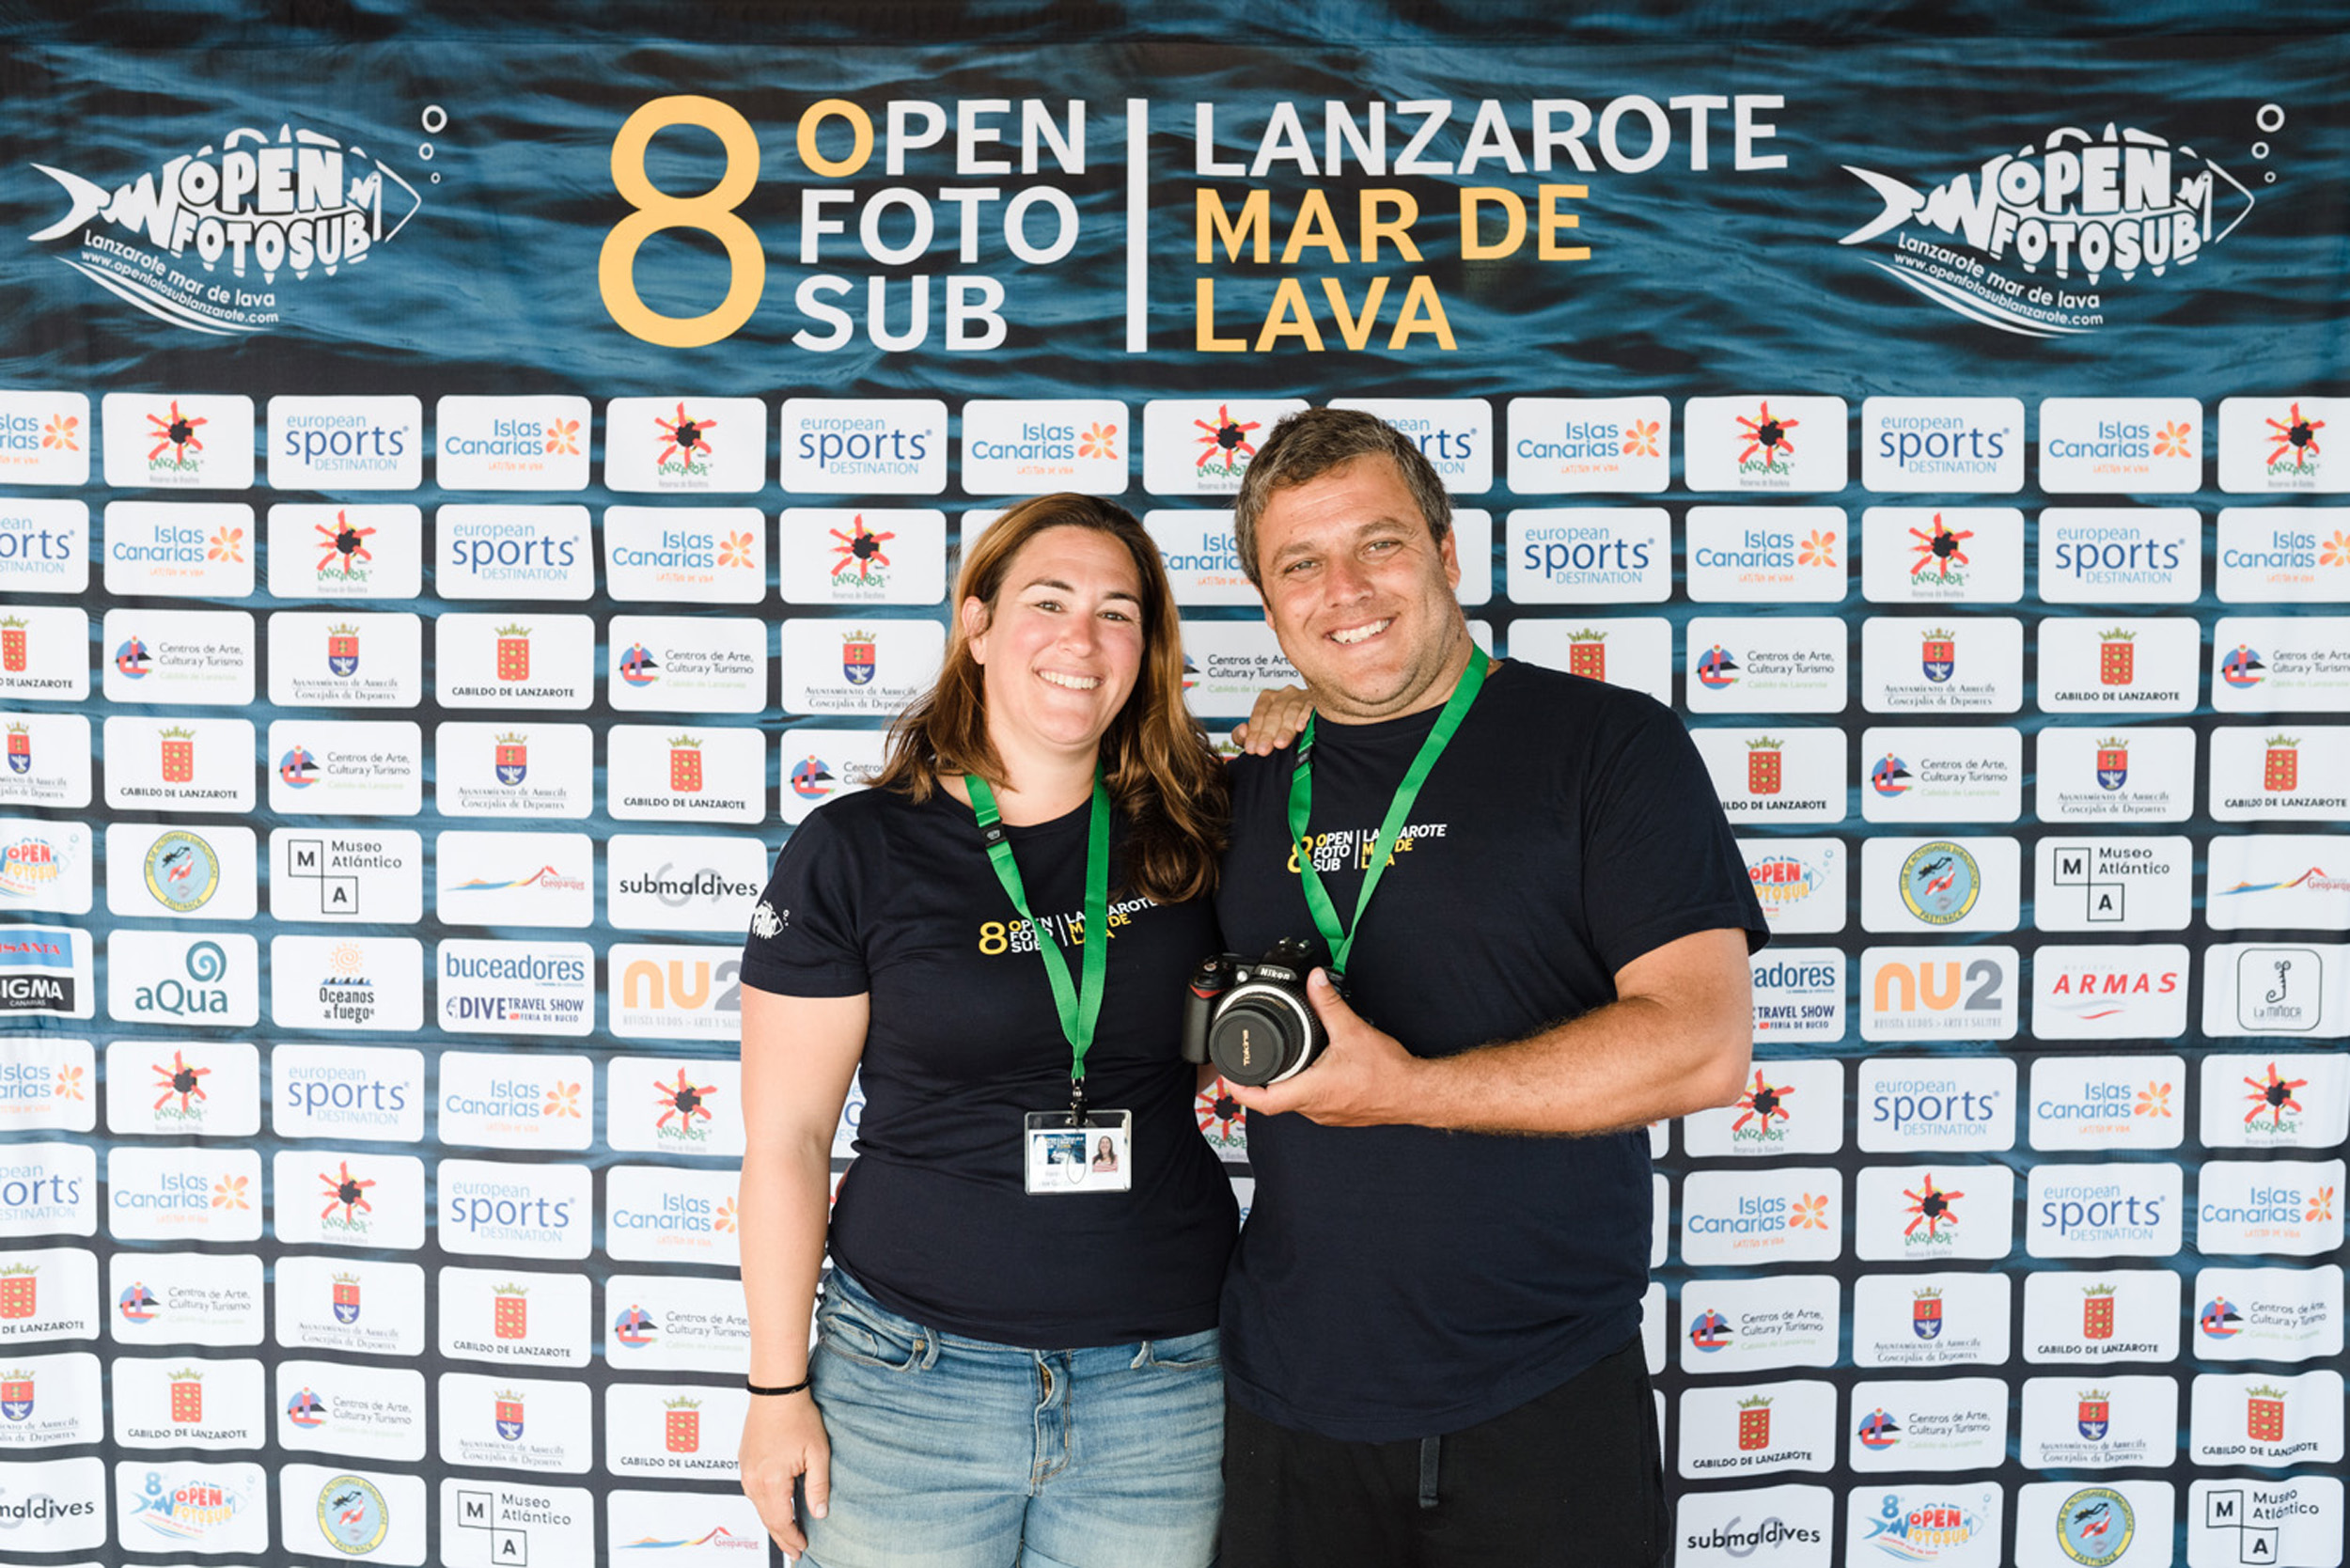 001_CAMPEON_ Daniel Ramírez y Flor González.jpg